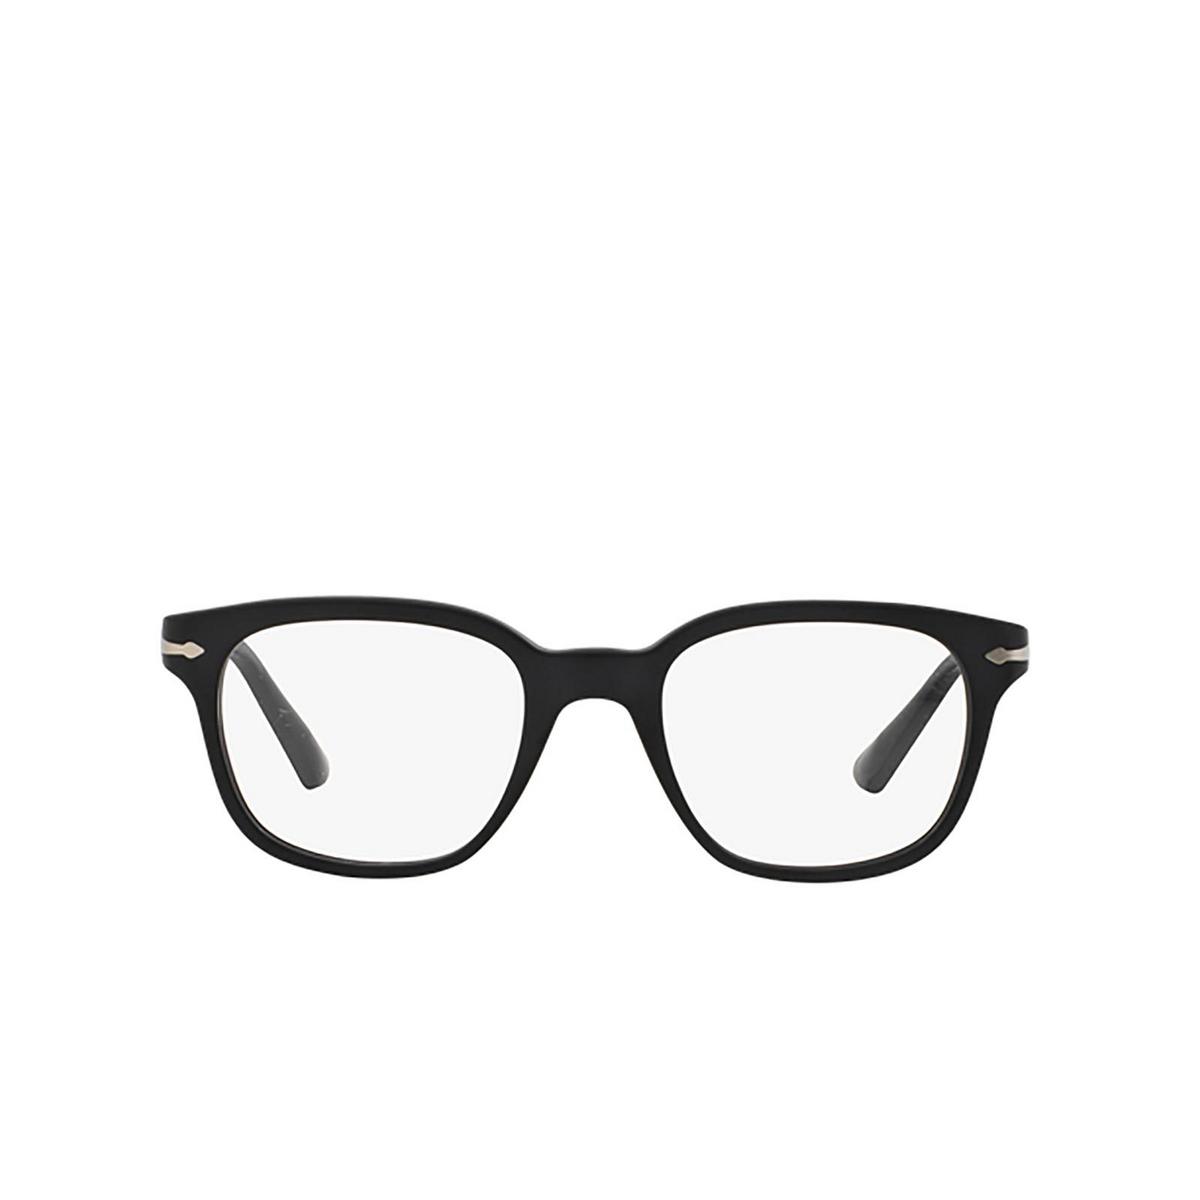 Persol® Square Eyeglasses: PO3093V color Black 9000 - front view.